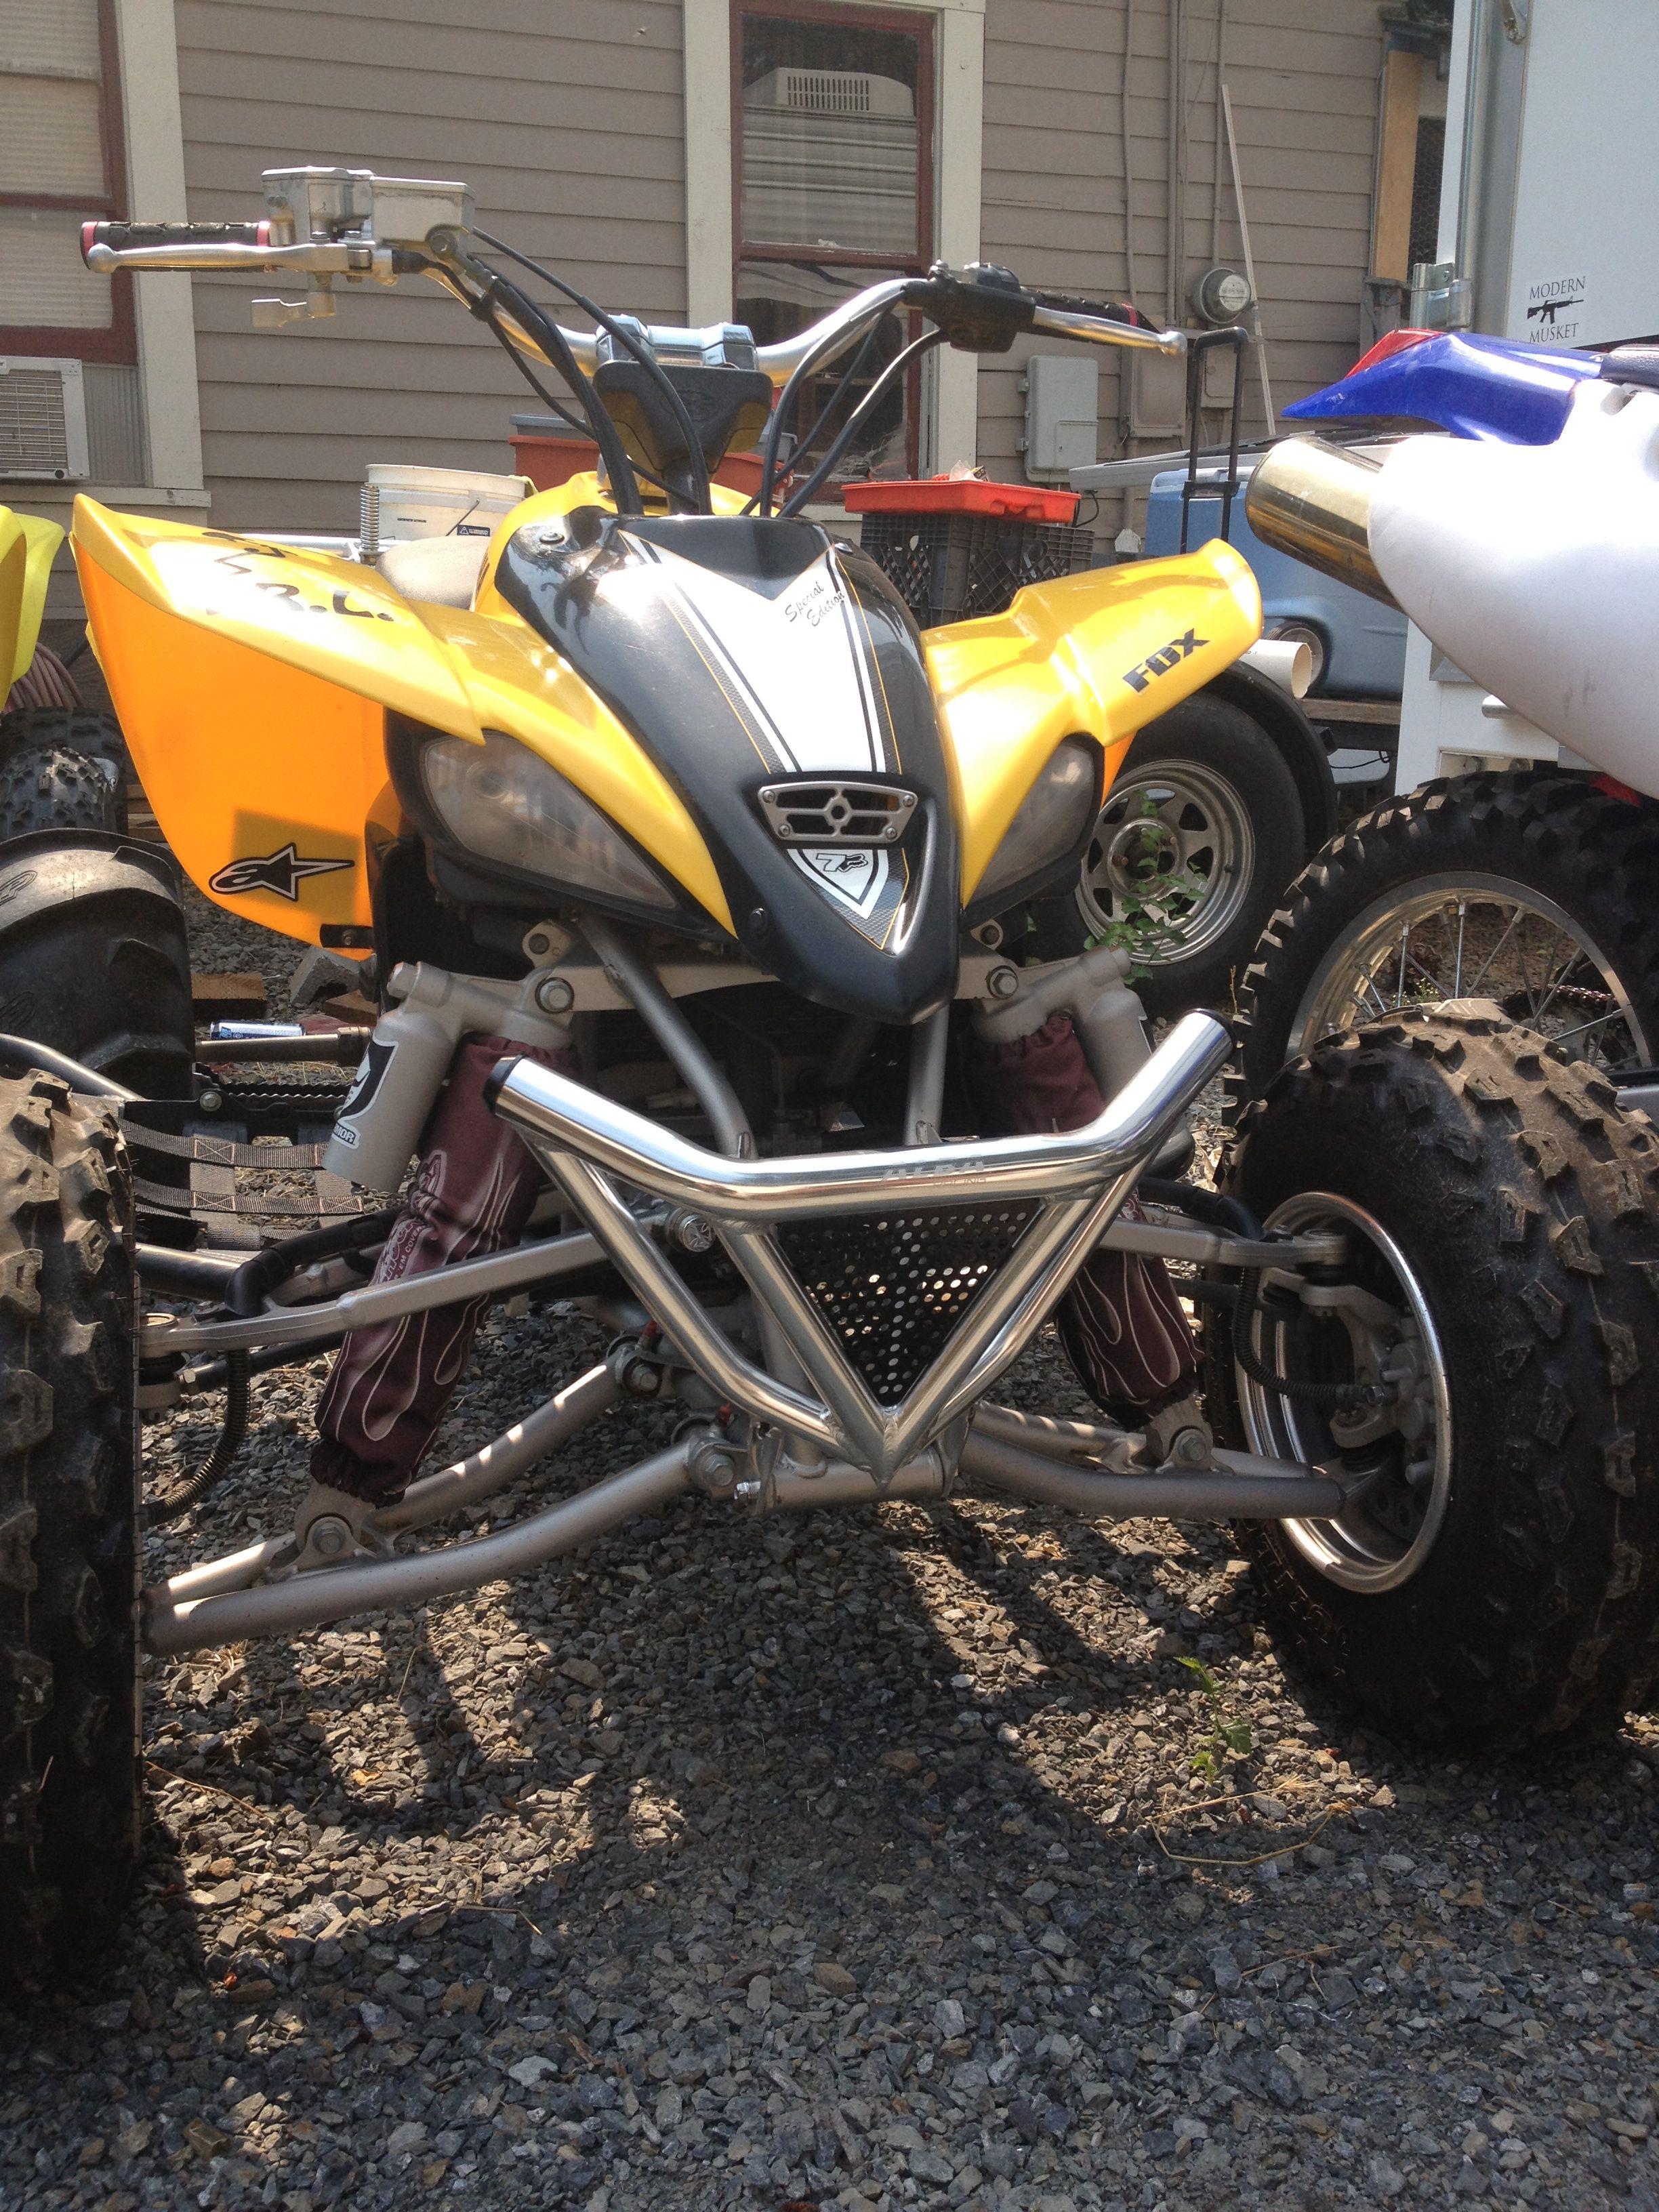 2006 YFZ450 Atv, Vehicles, Motorcycle